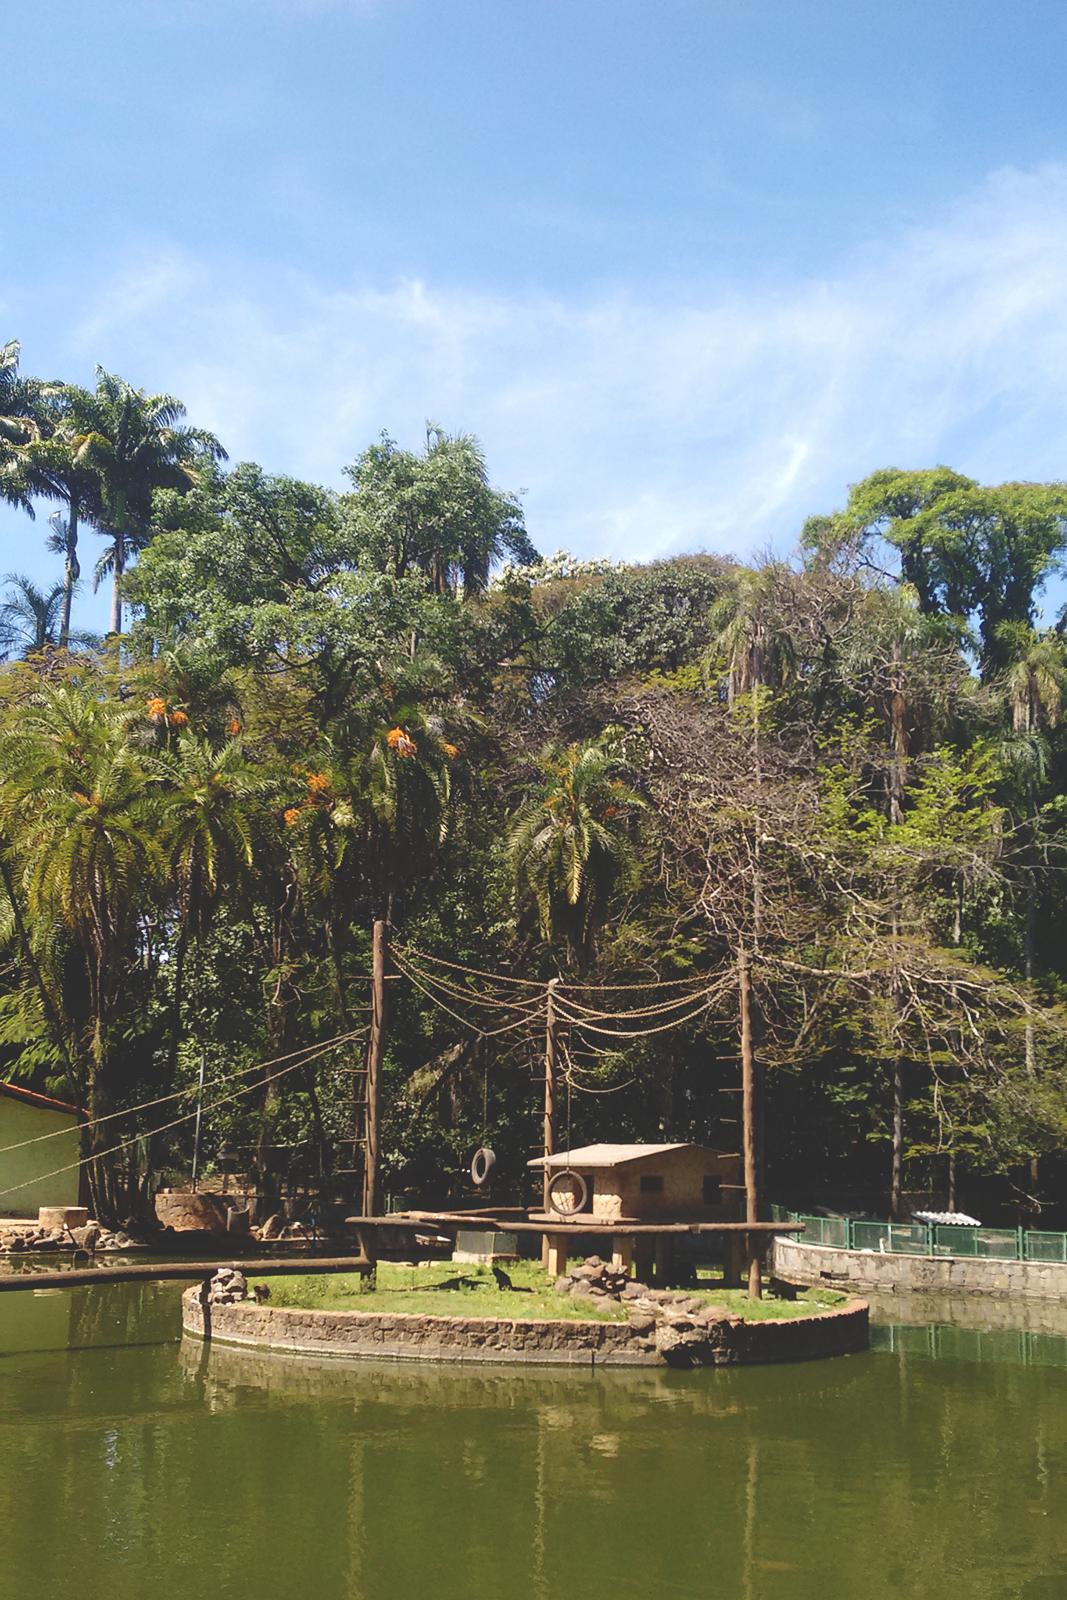 macacos lago zoológico campinas